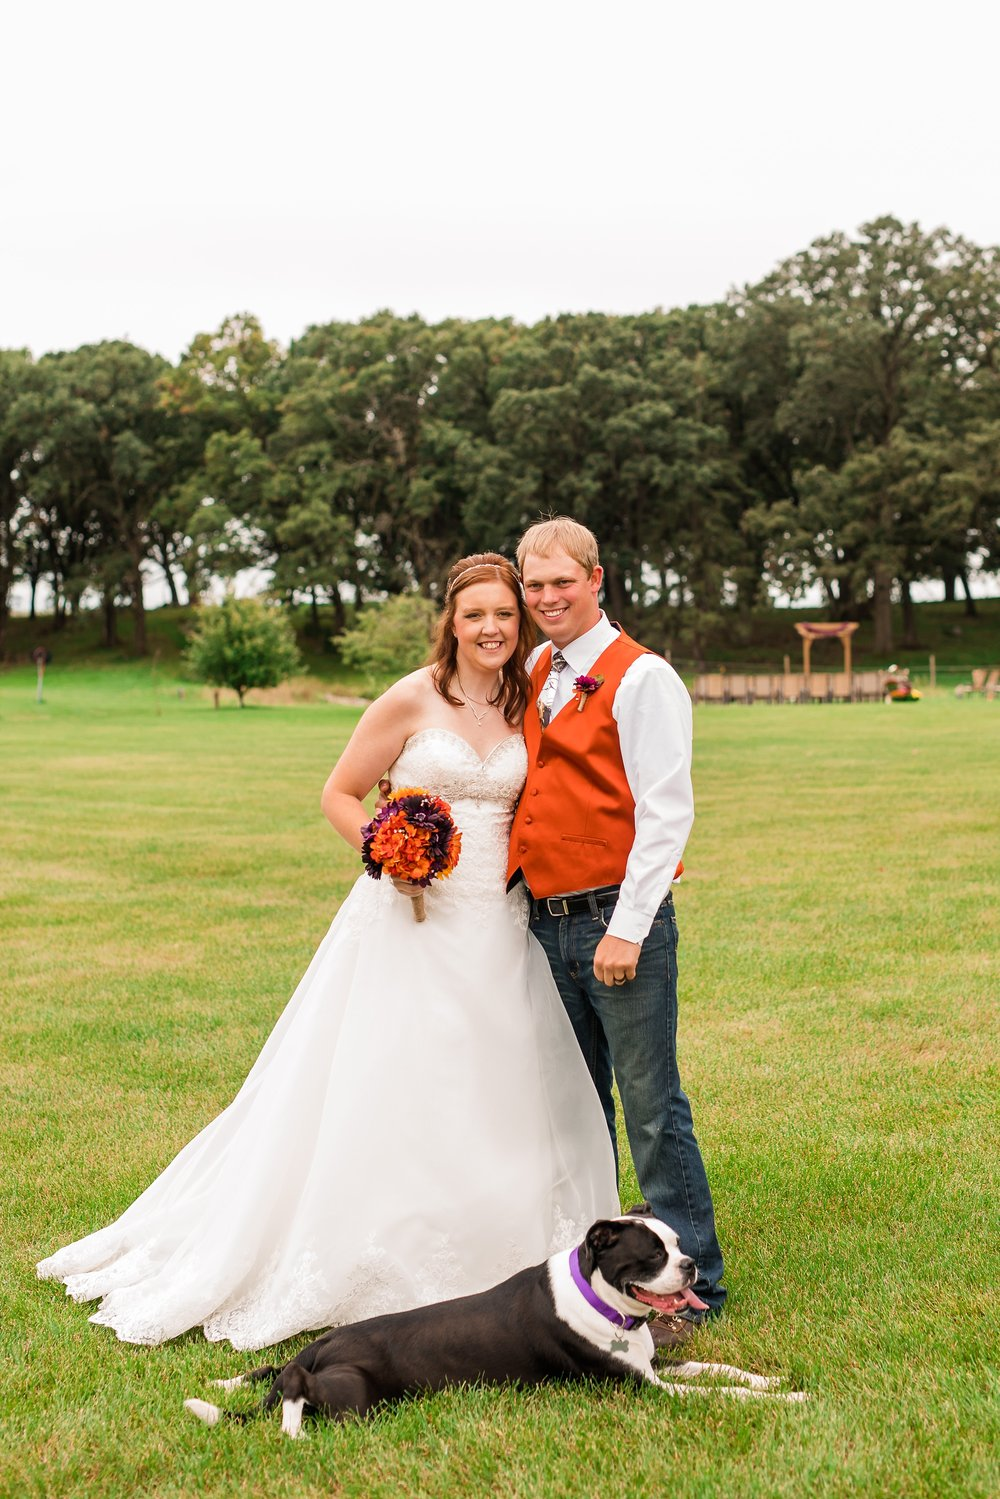 Amber Langerud_Lake Park MN Barn wedding at the Hitching Post_0430.jpg